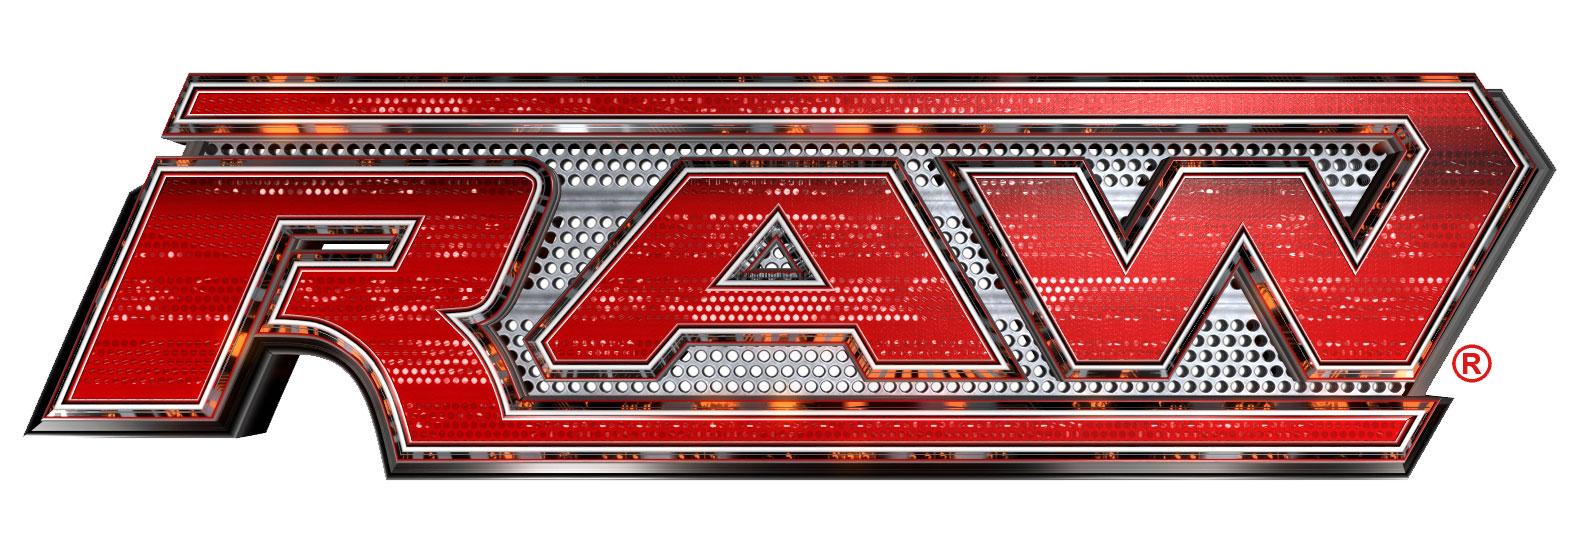 WWE Raw in Los Angeles, Ca | SoCalUNCENSORED com